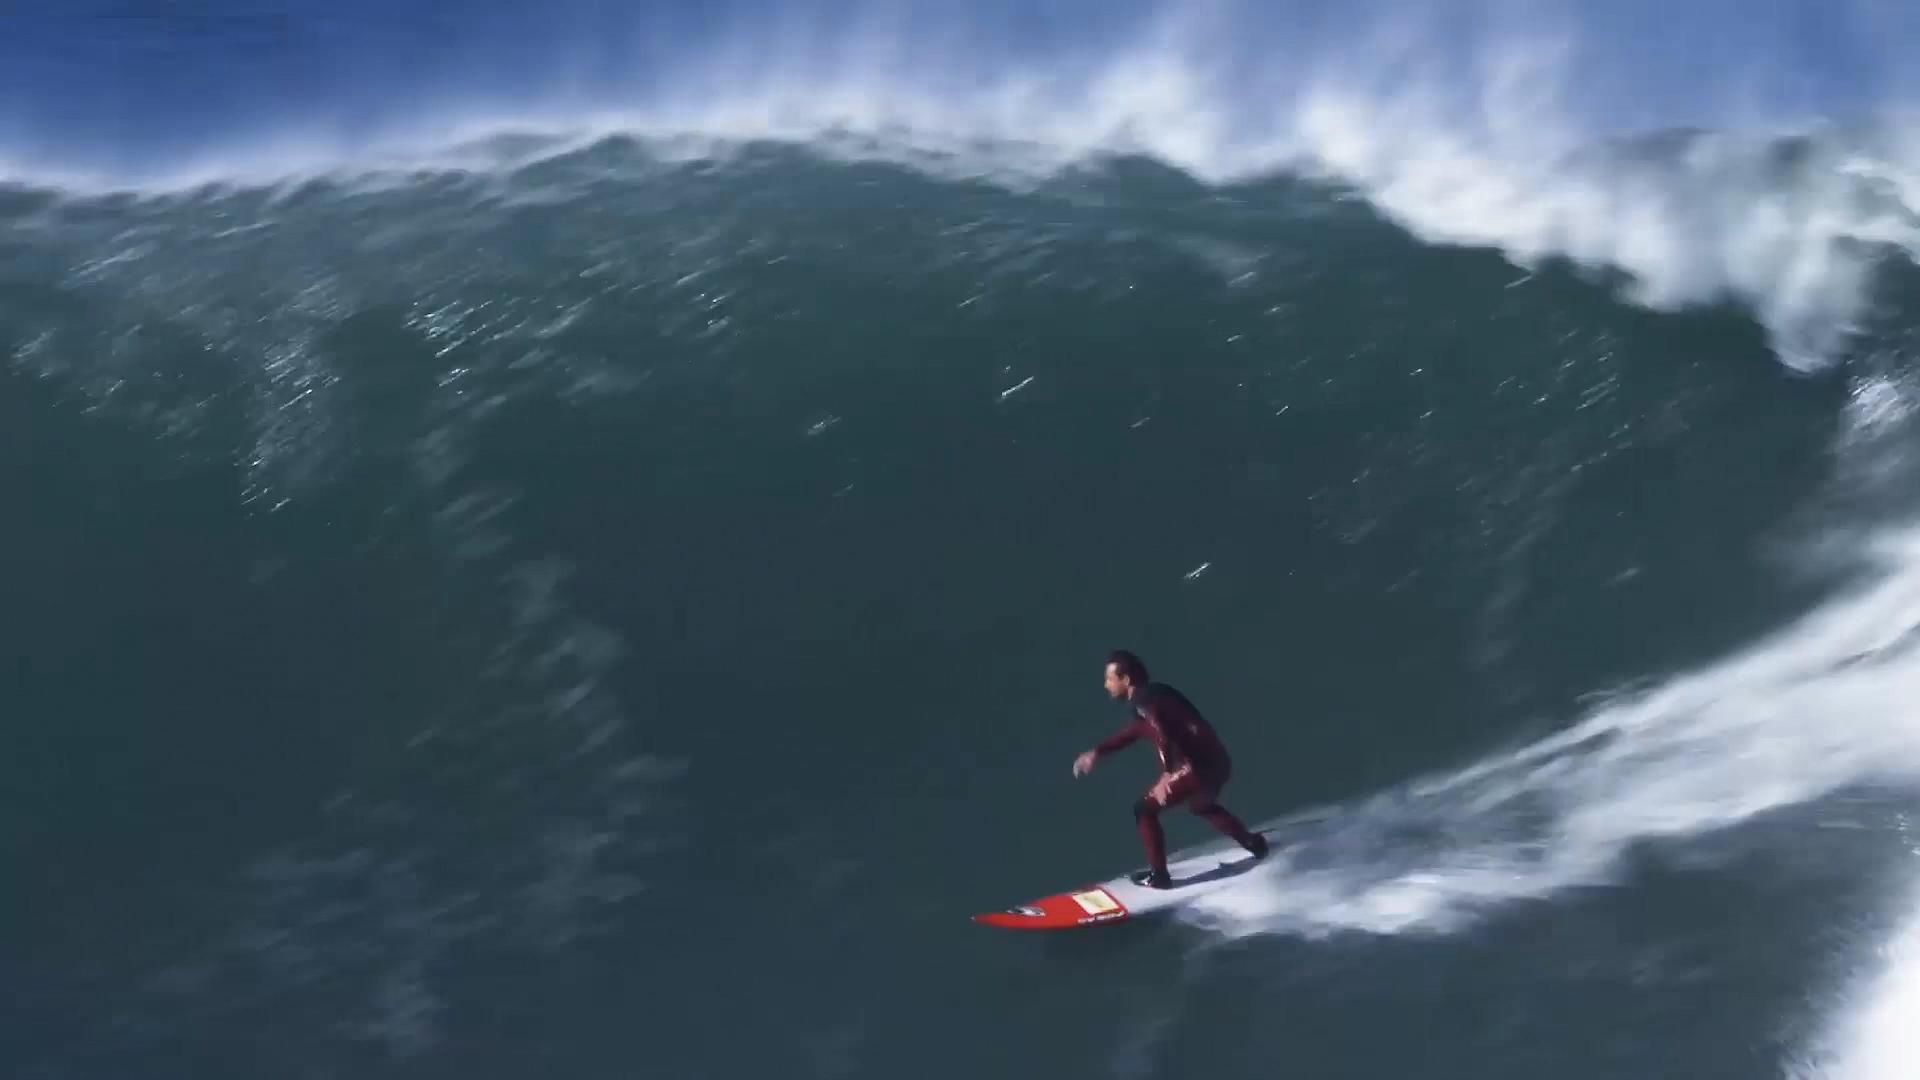 Big Wave in the Basque Country Ingles, with Laurels. Azkena Carrascon.MP4.Imagen fija014.jpg